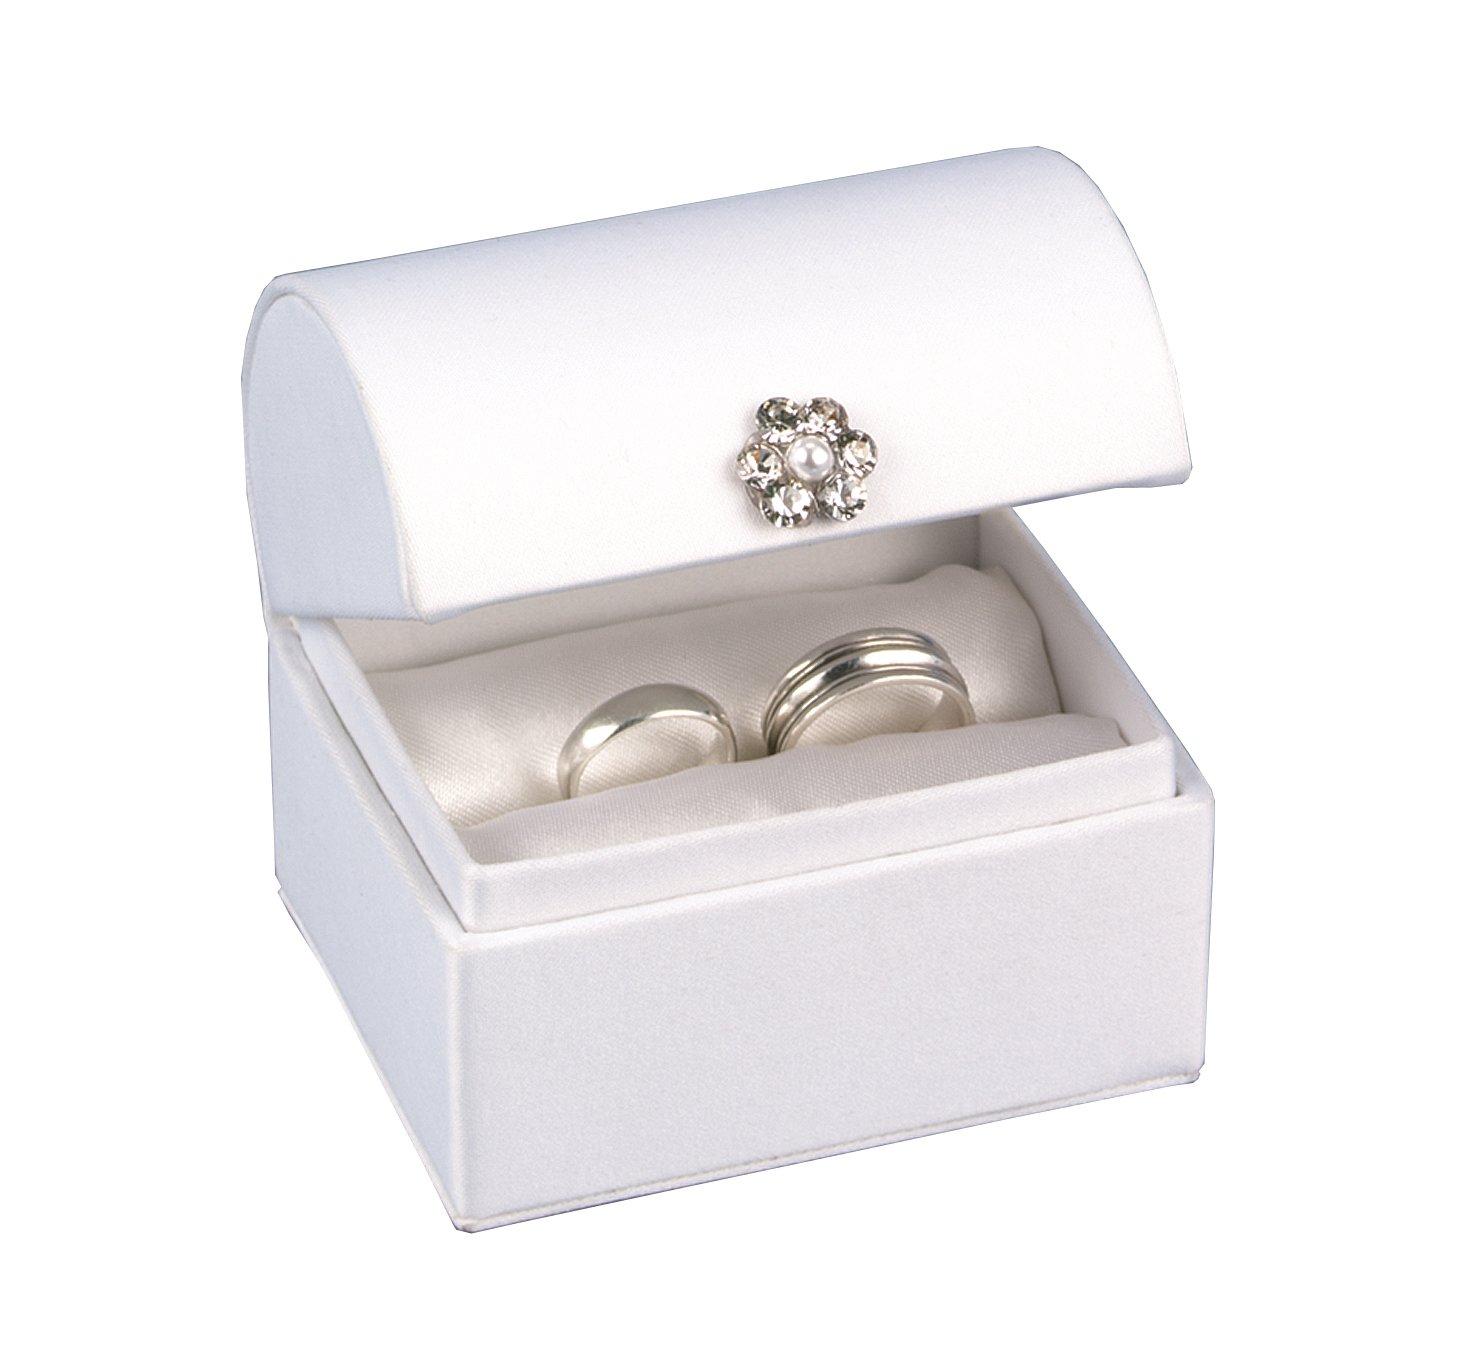 Amazon.com: Hortense B. Hewitt Wedding Accessories White Satin ...